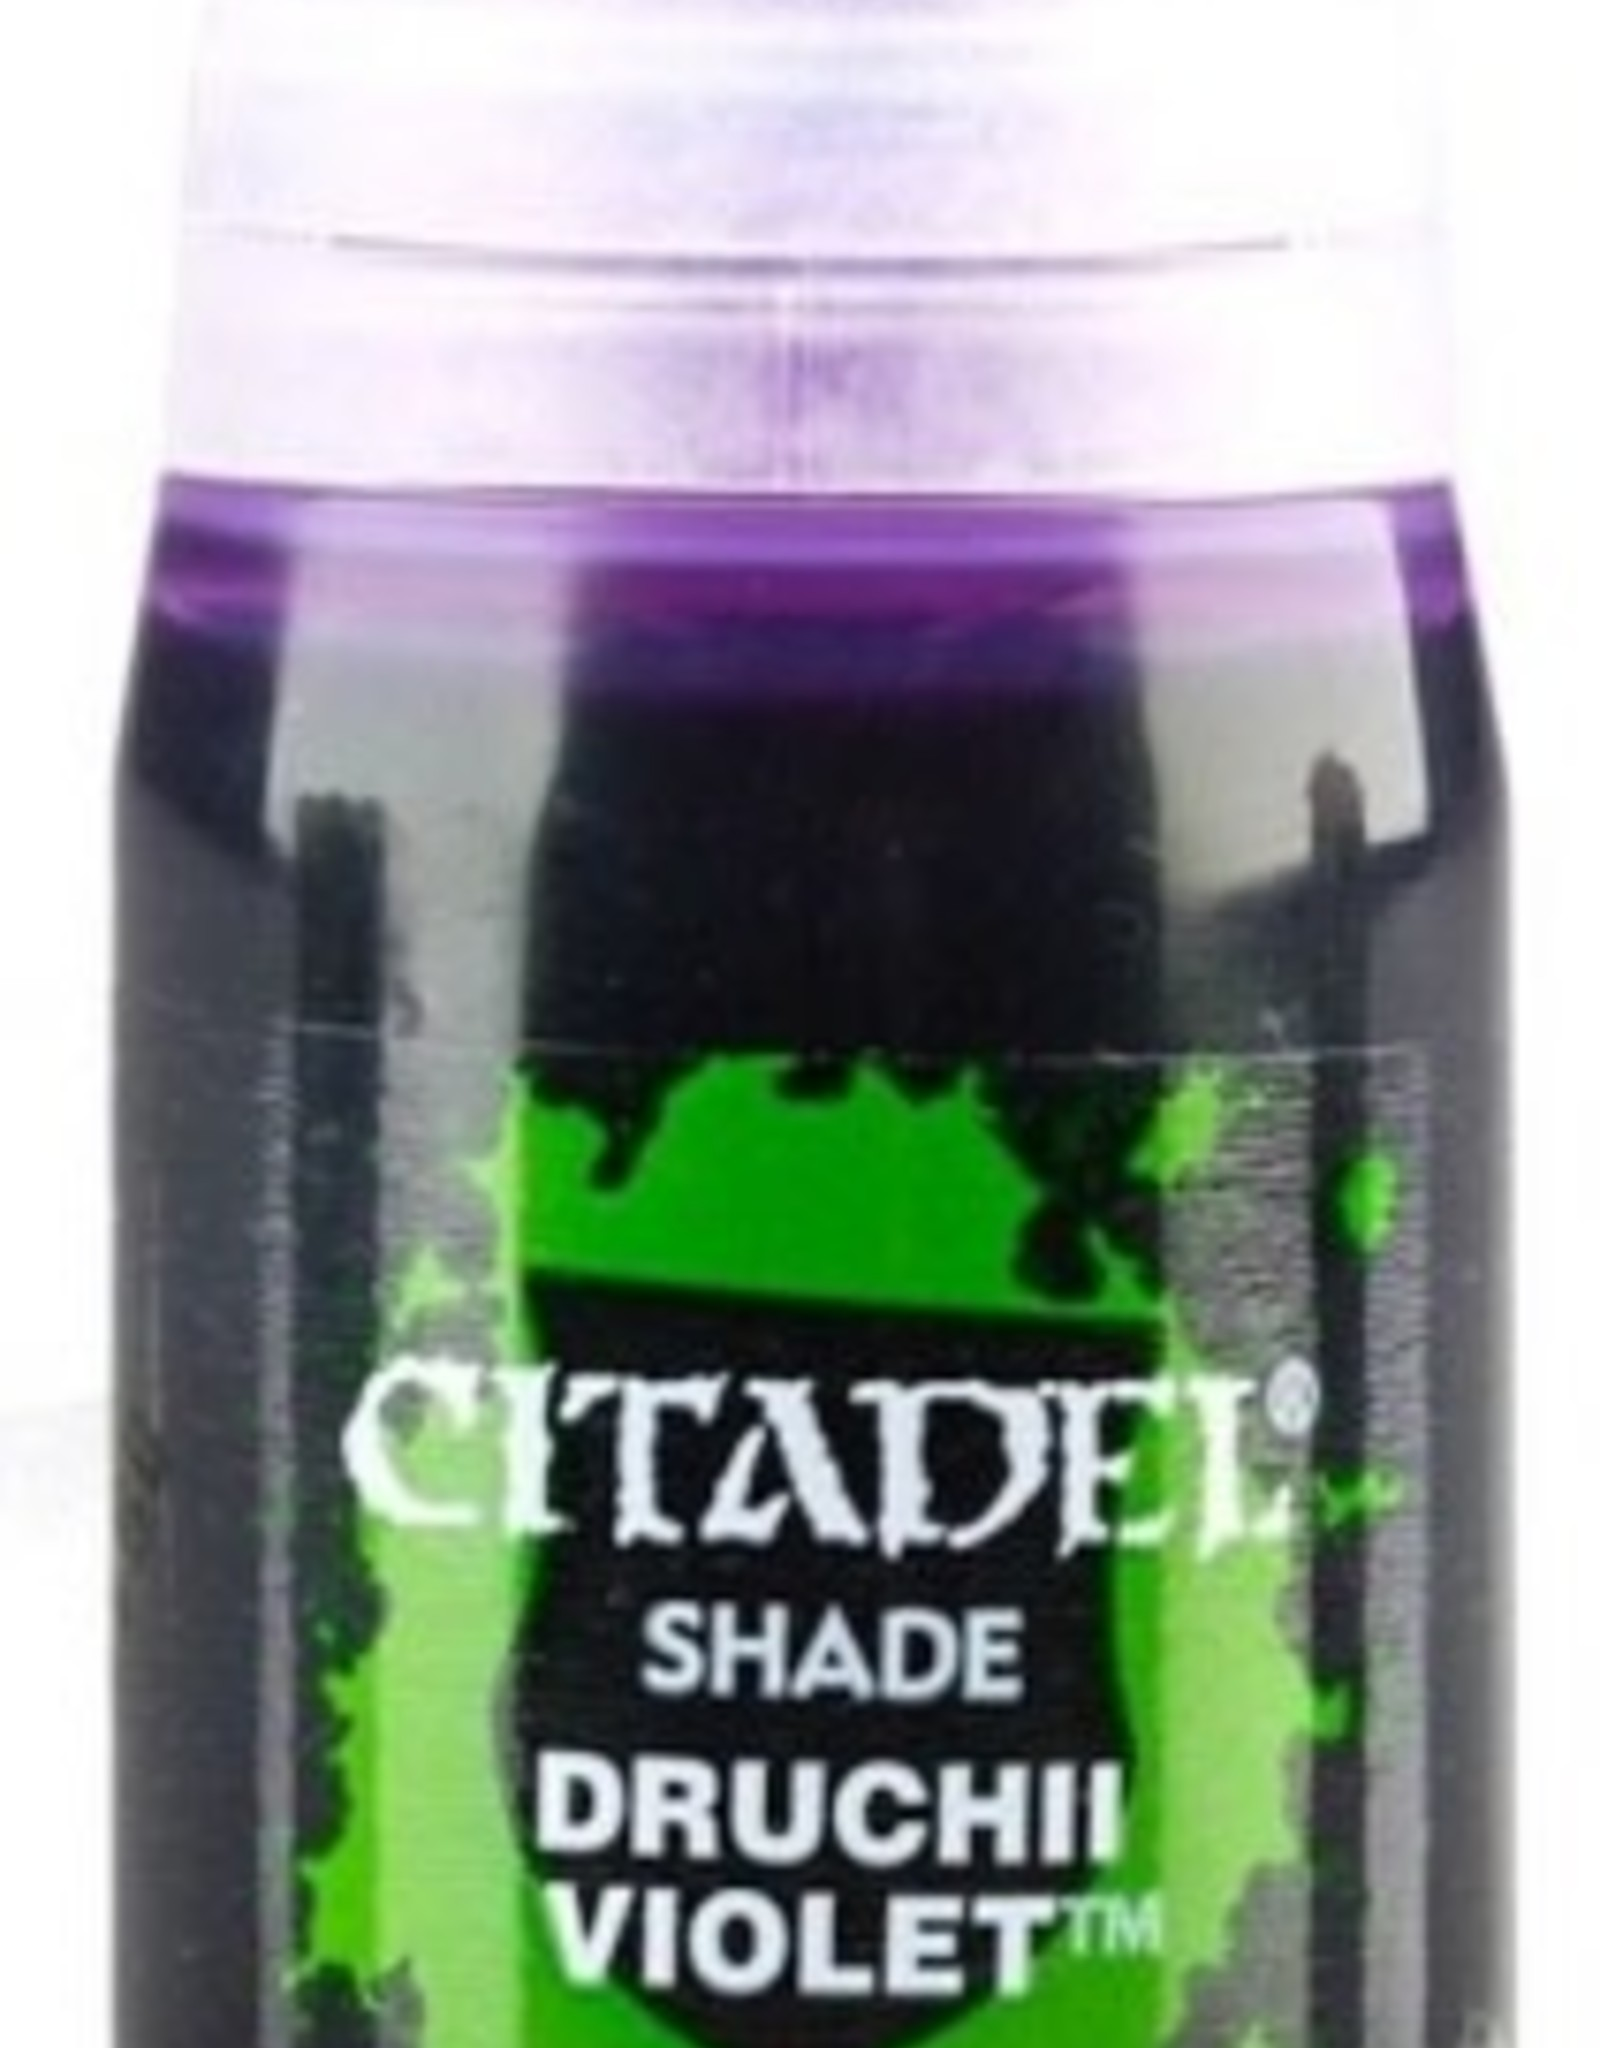 Games Workshop Citadel Paint: Shade - Druchii Violet 24ml